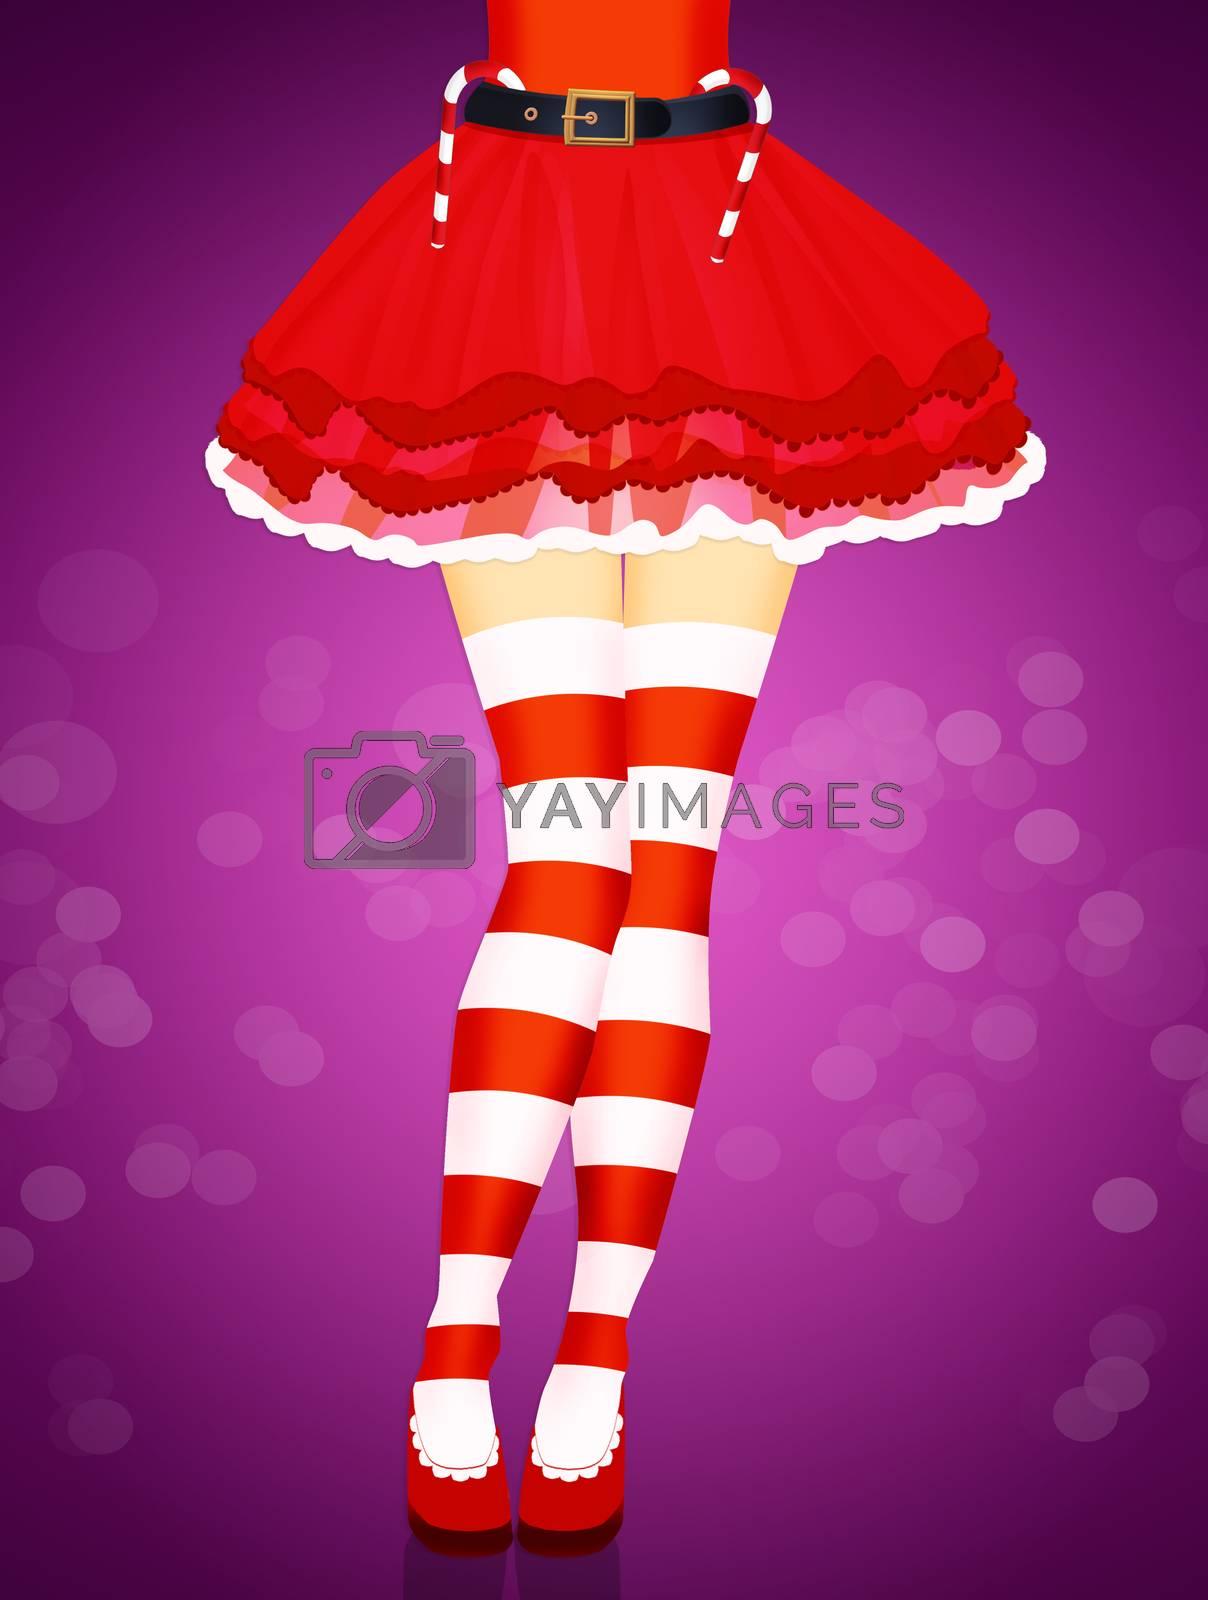 illustration of woman legs color red socks Christmas